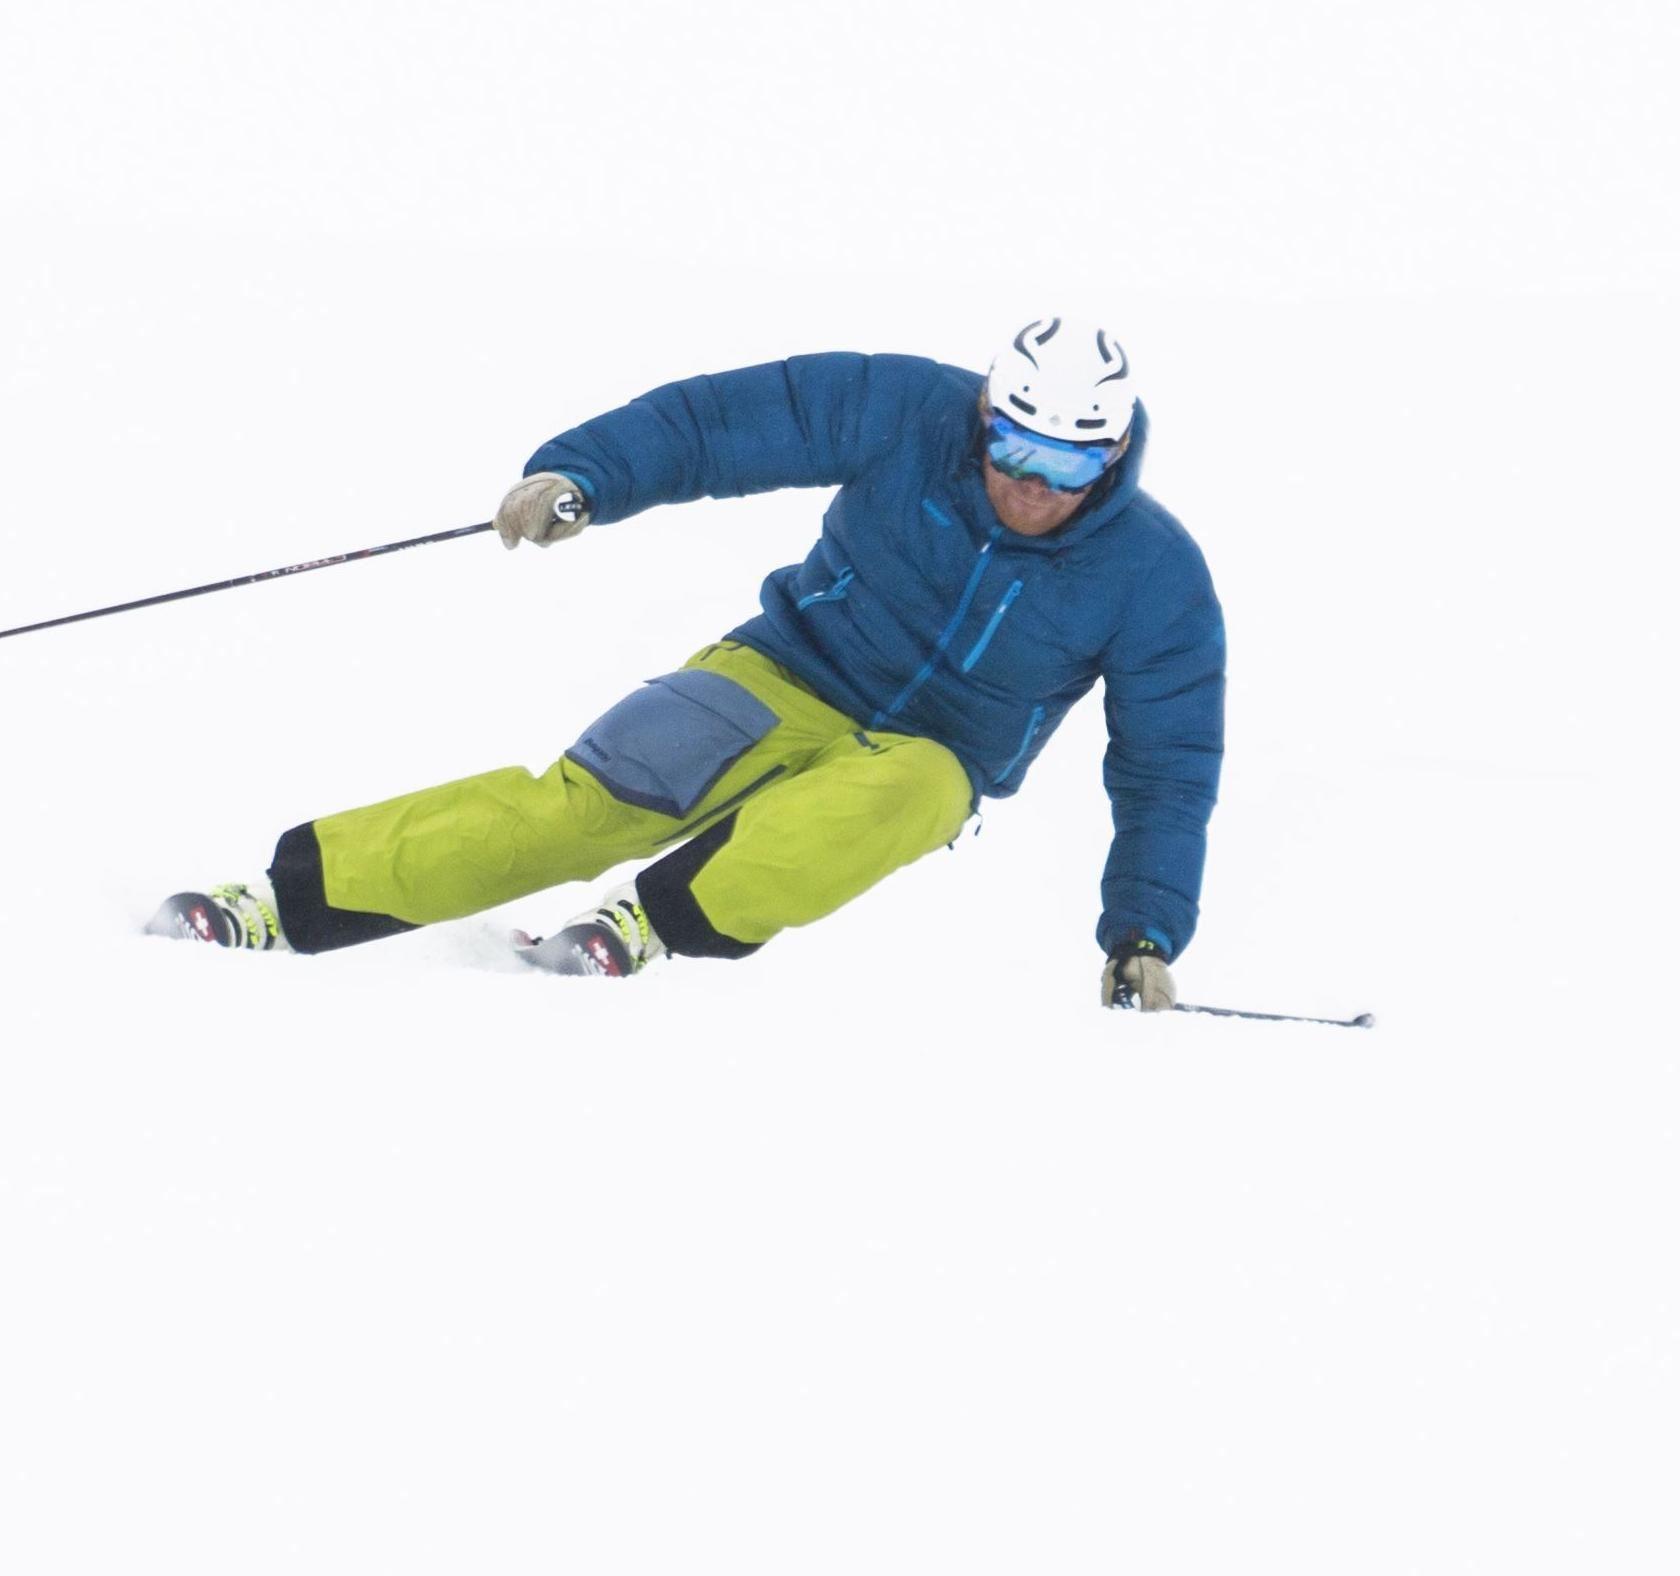 Teknikk-kurs i alpint